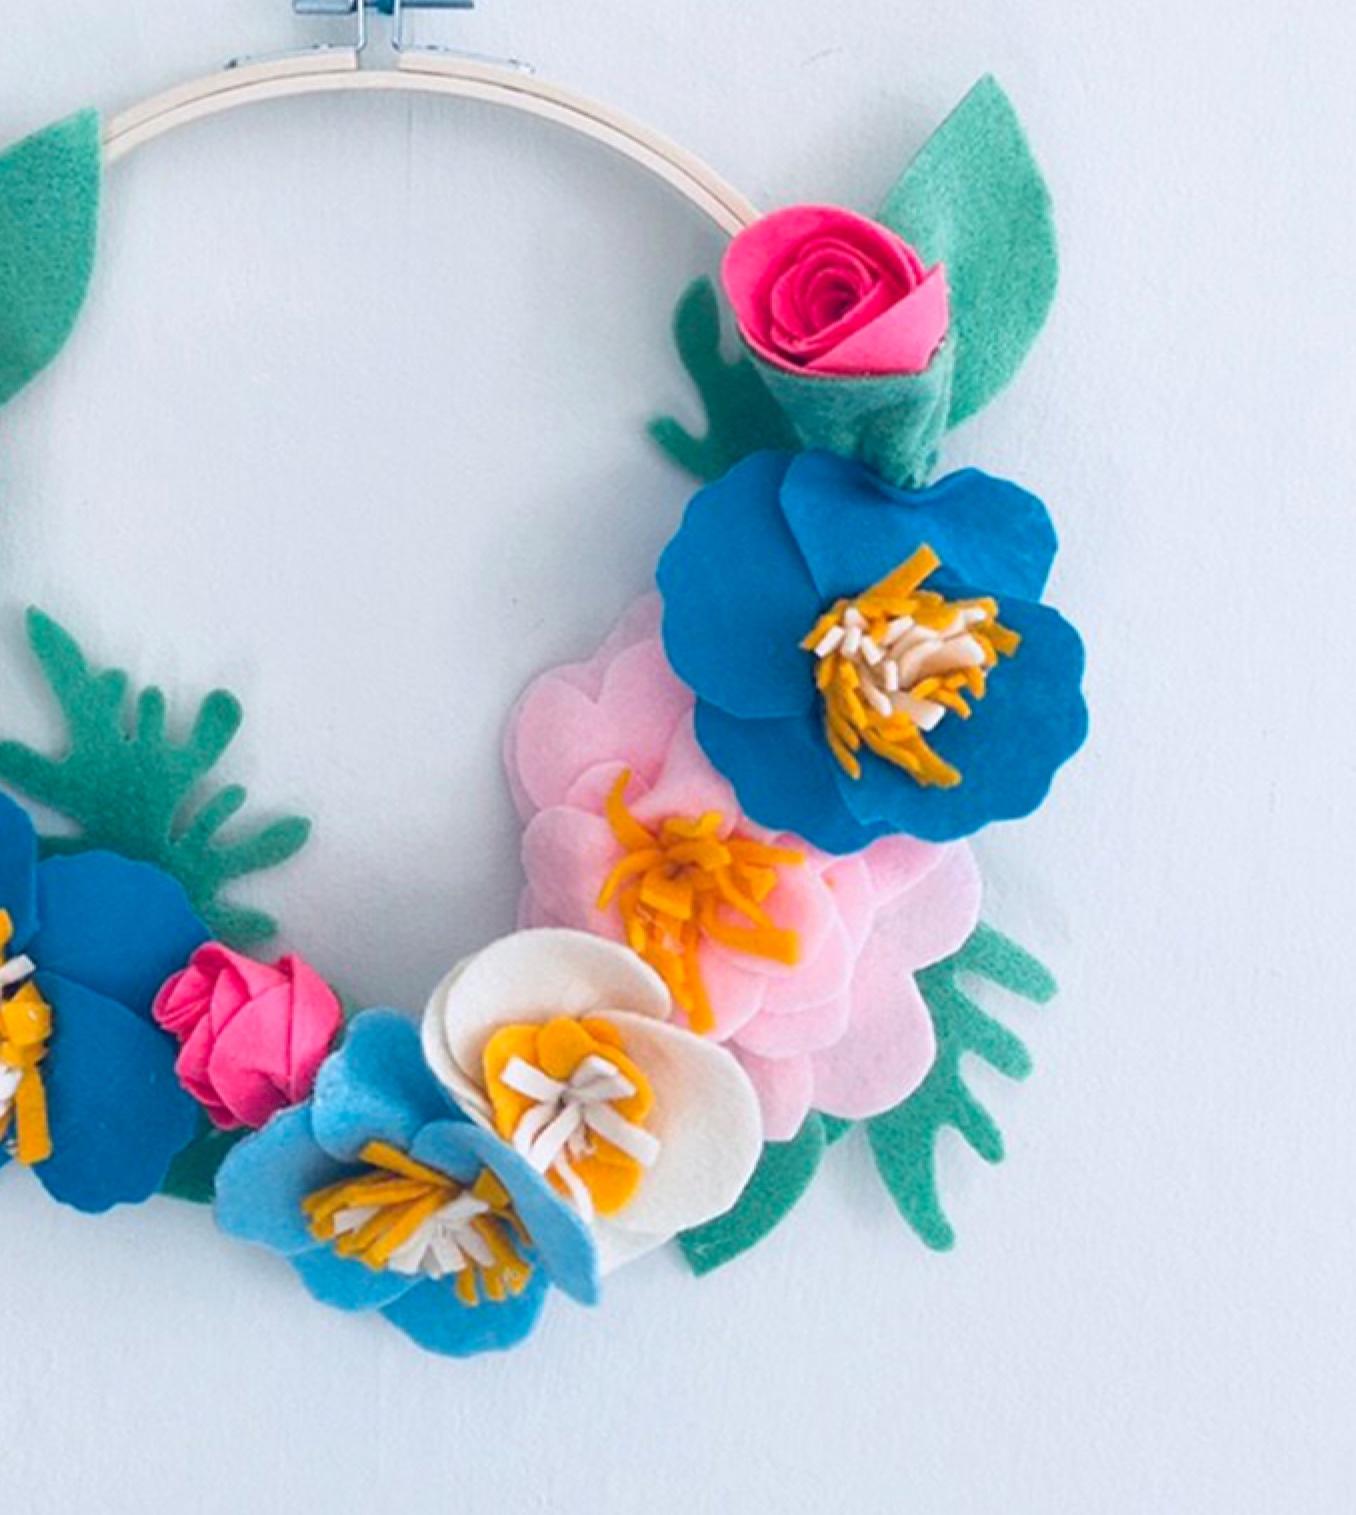 Felt+Flower+Wreath+.jpg